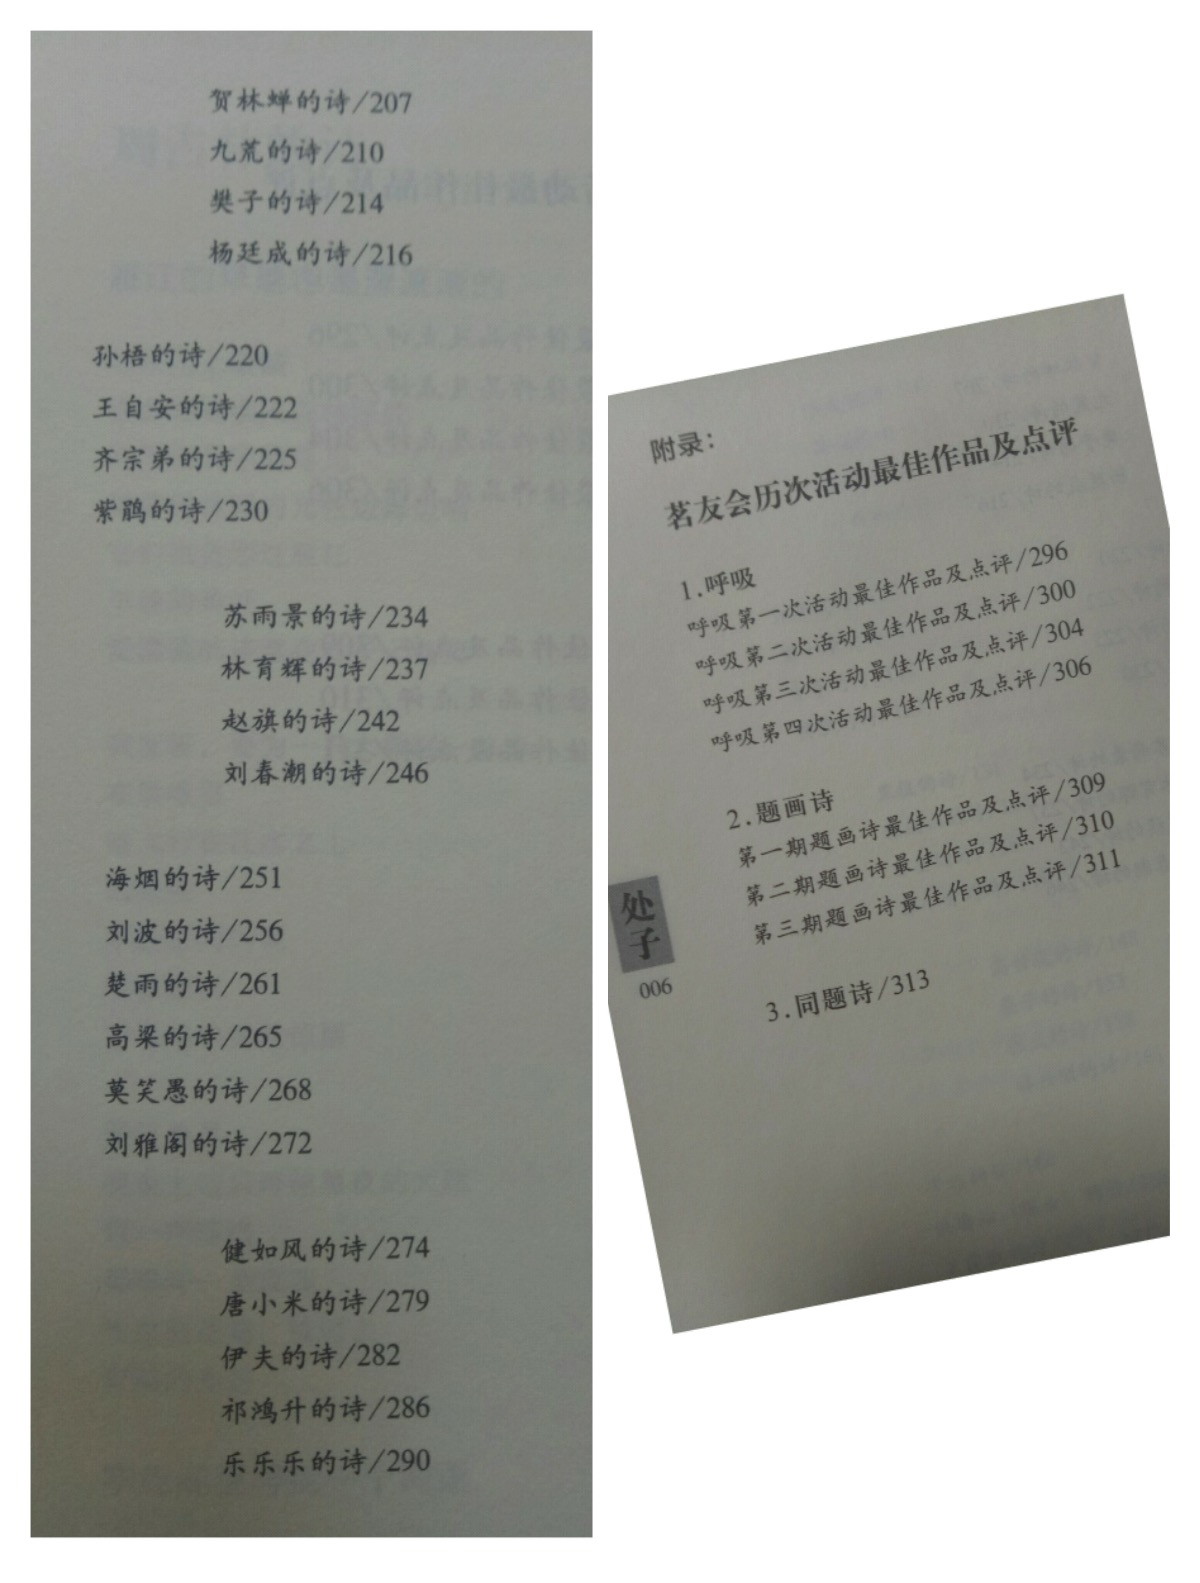 E1D437D8-CECE-4A12-9D71-CD3B8163E232.jpeg